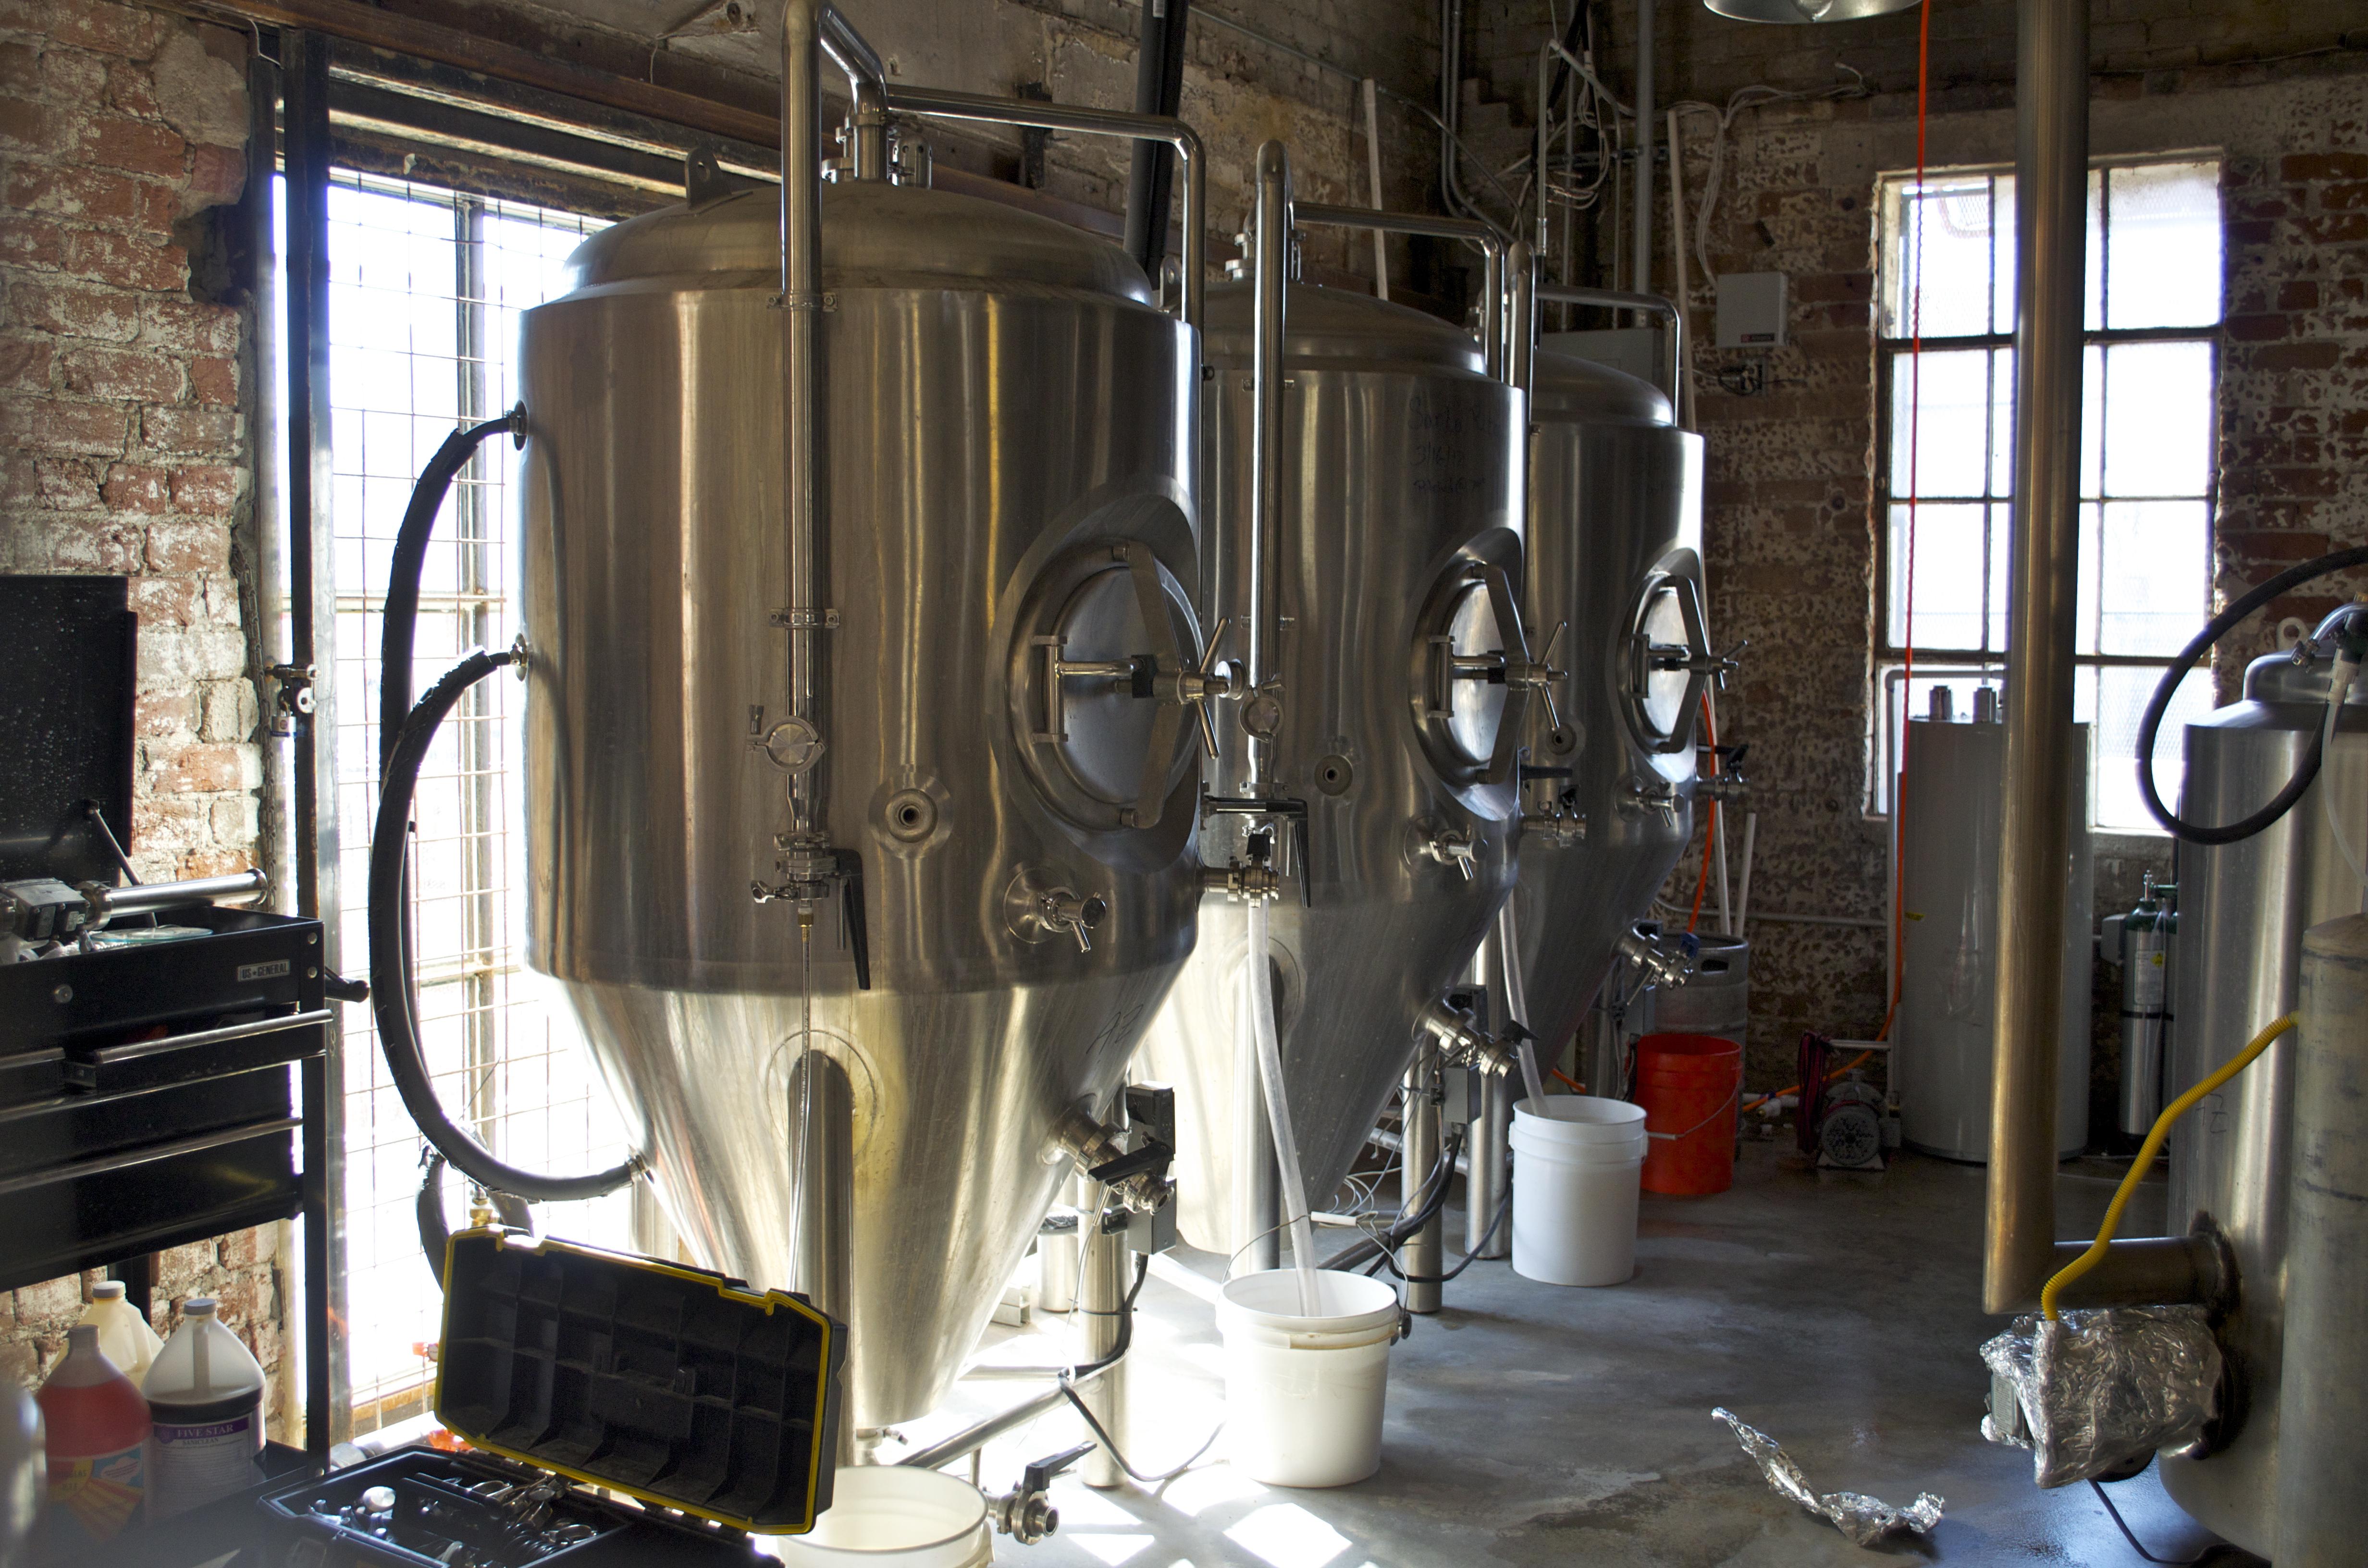 Borderlands Brewing Company Bites N Brews